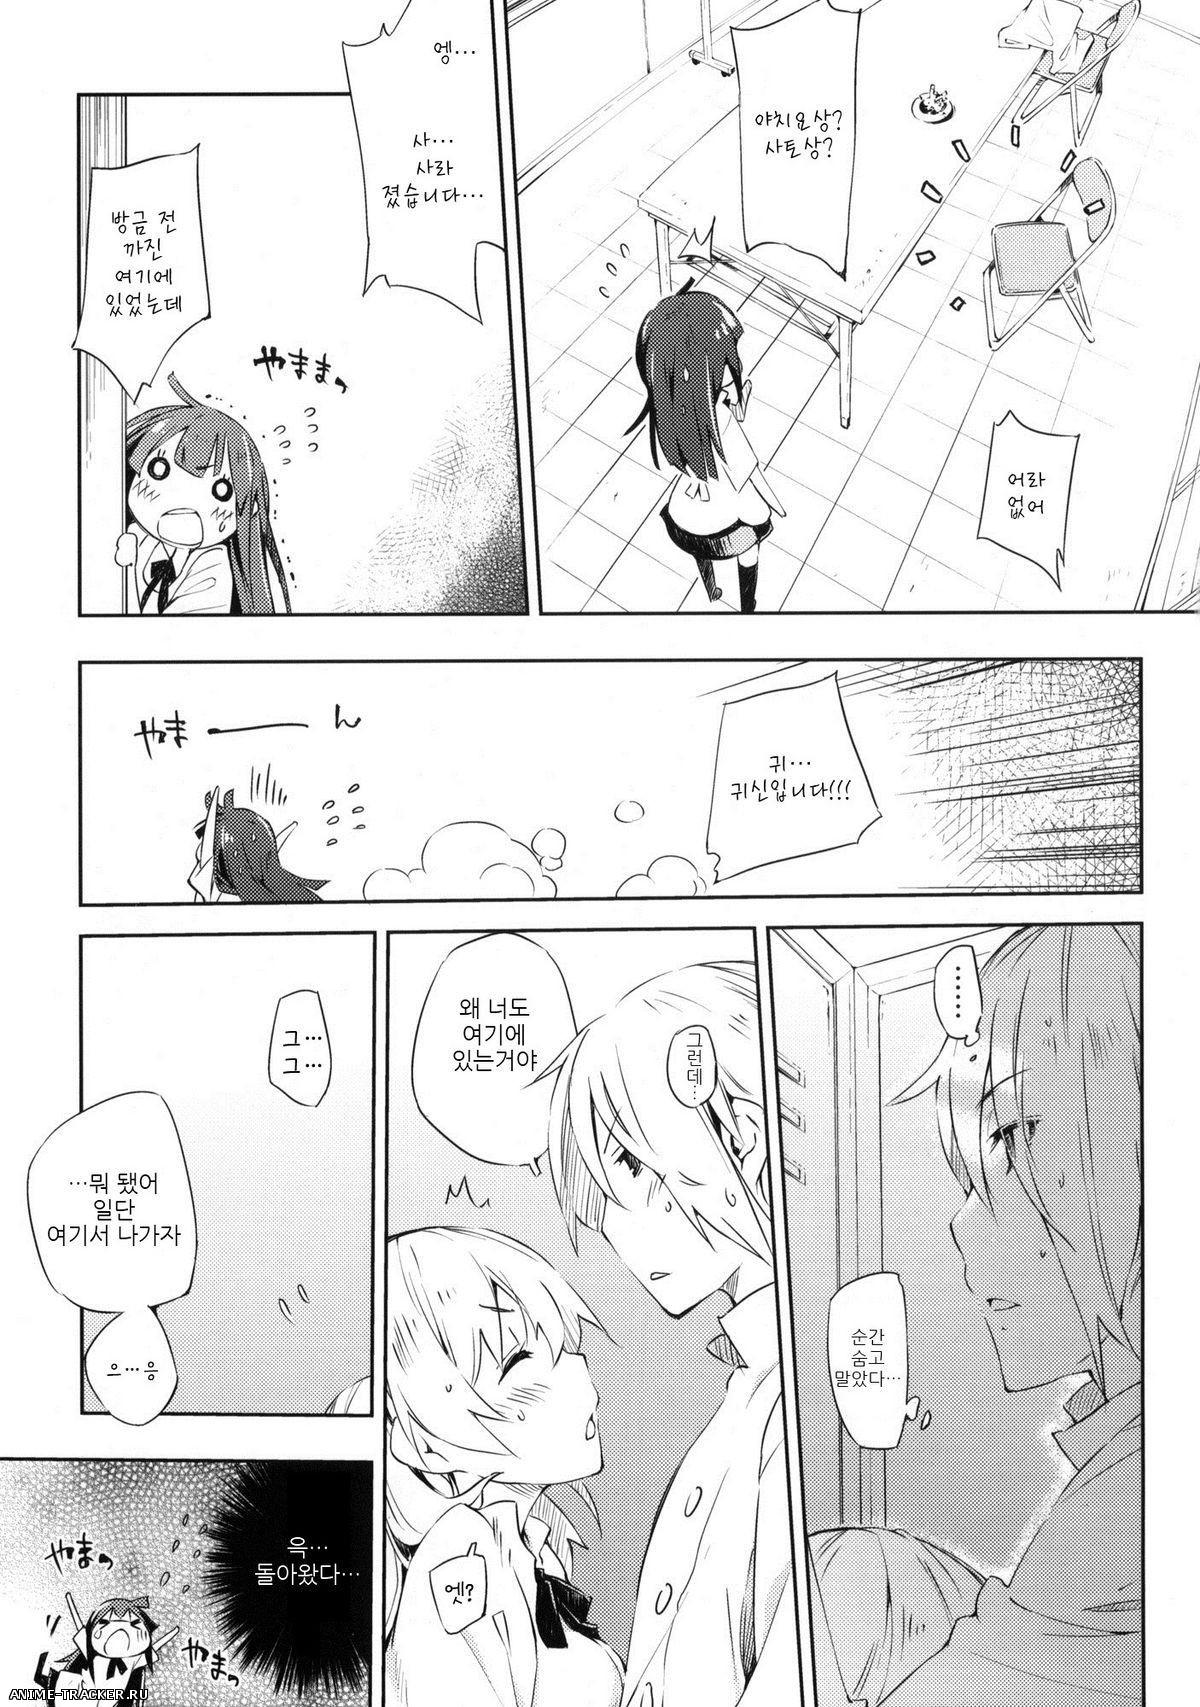 Kokonoka / Mono x Chro — Сборник хентай манги [Сen] [JAP,RUS,ENG] Manga Hentai